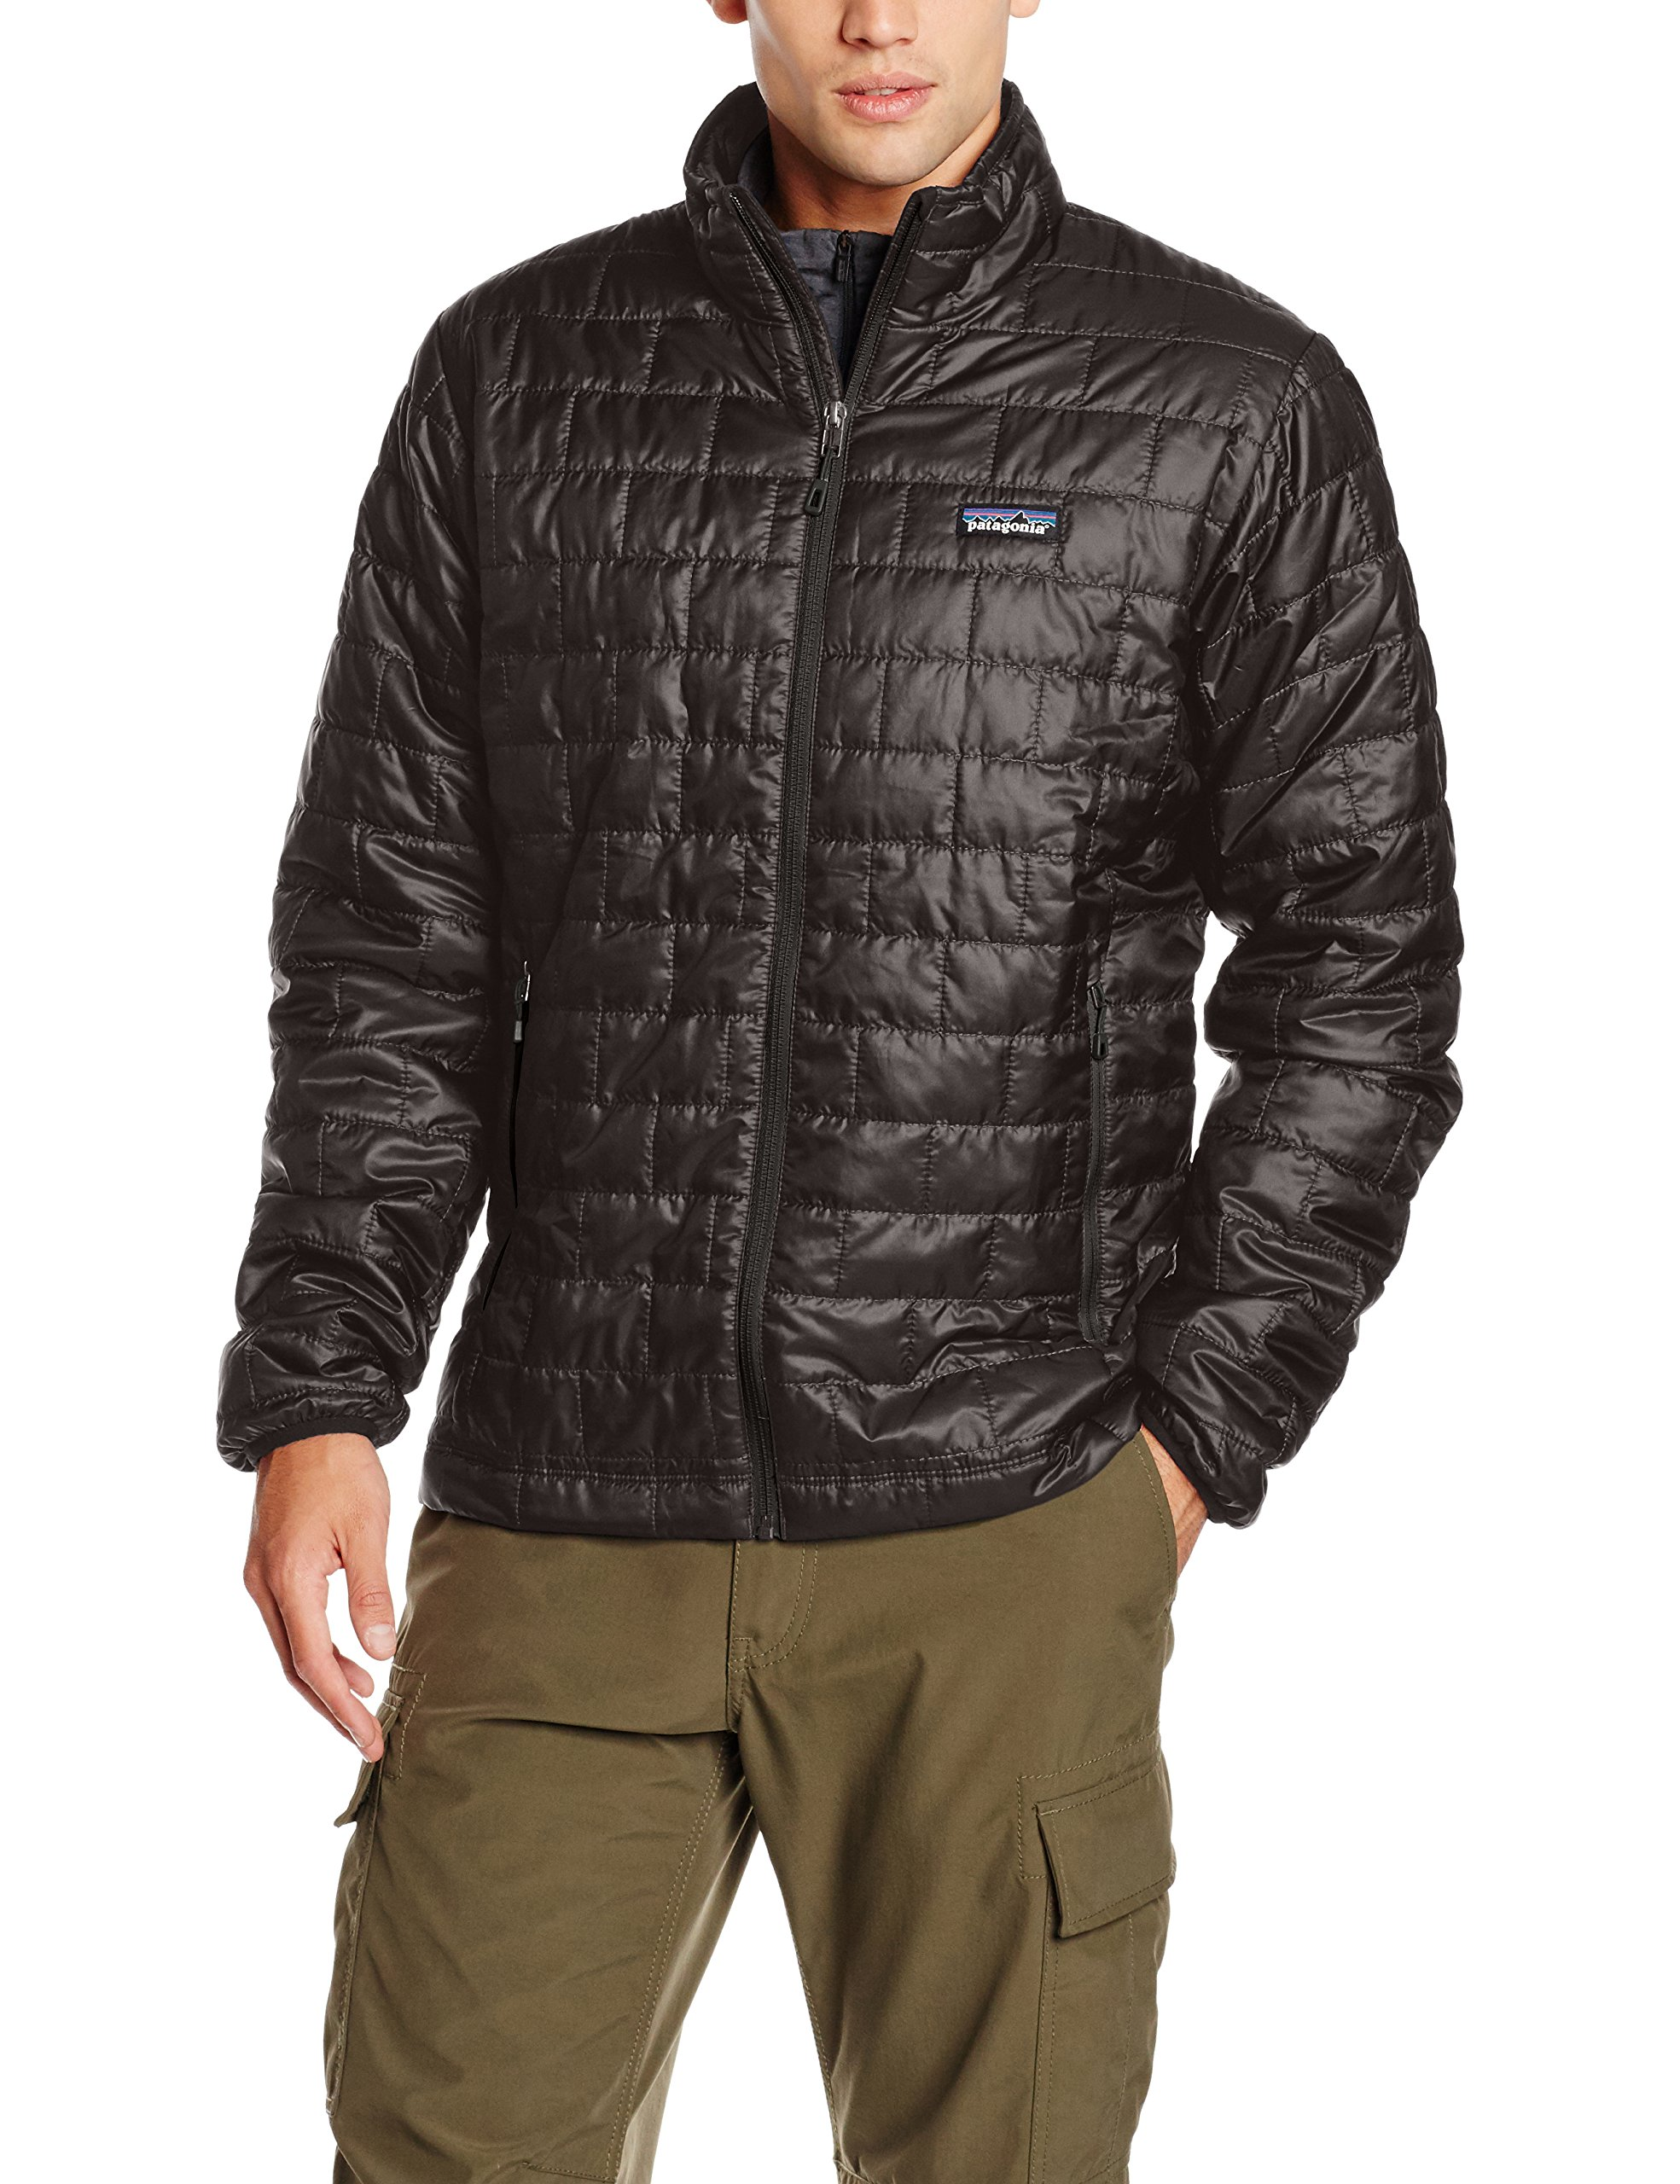 Patagonia Nano Puff Insulated Jacket (Medium, Black) by Patagonia